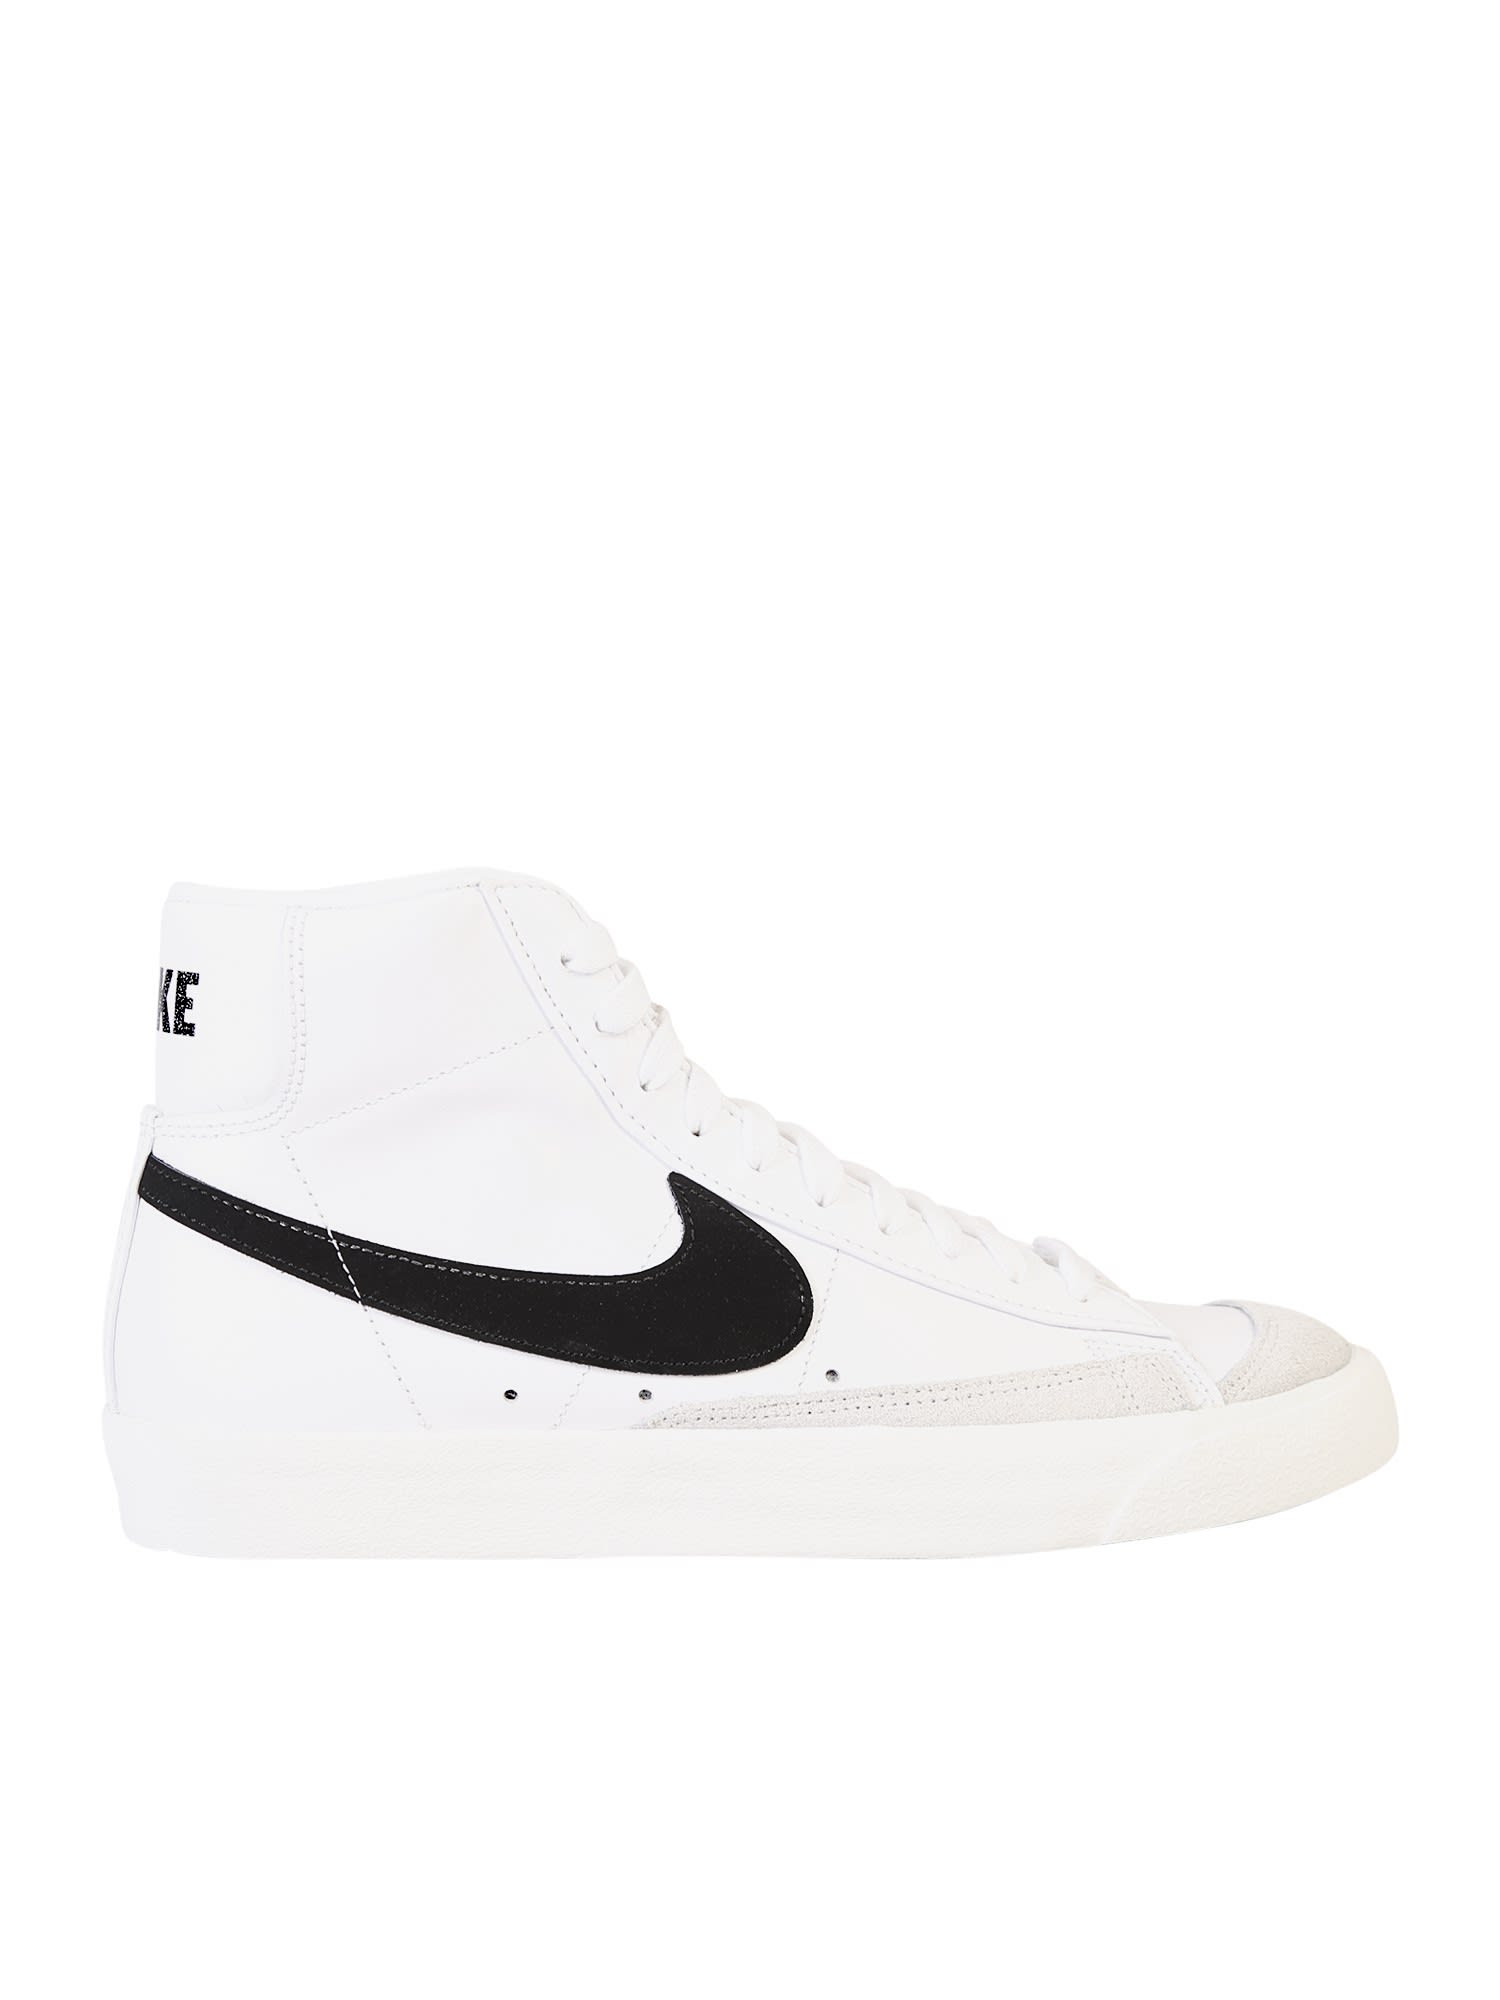 Nike Blazer Mid 77 Vintage Leather Sneakers